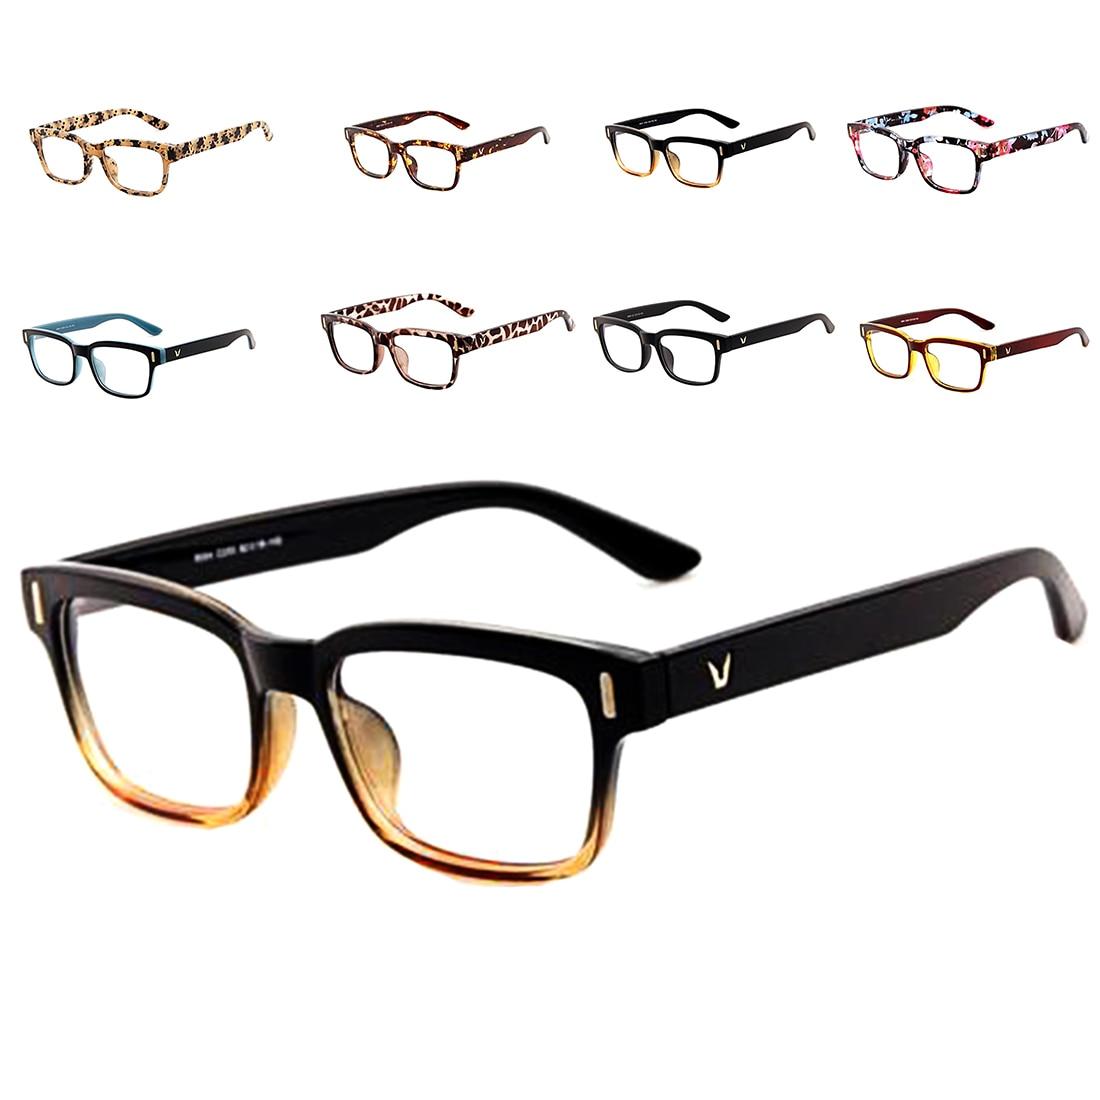 New 2016 Fashion V-Shaped Box Eye Glasses Frames Brand For Men New Women Computer Frames Eyewear Vintage Armacao Oculos De Grau